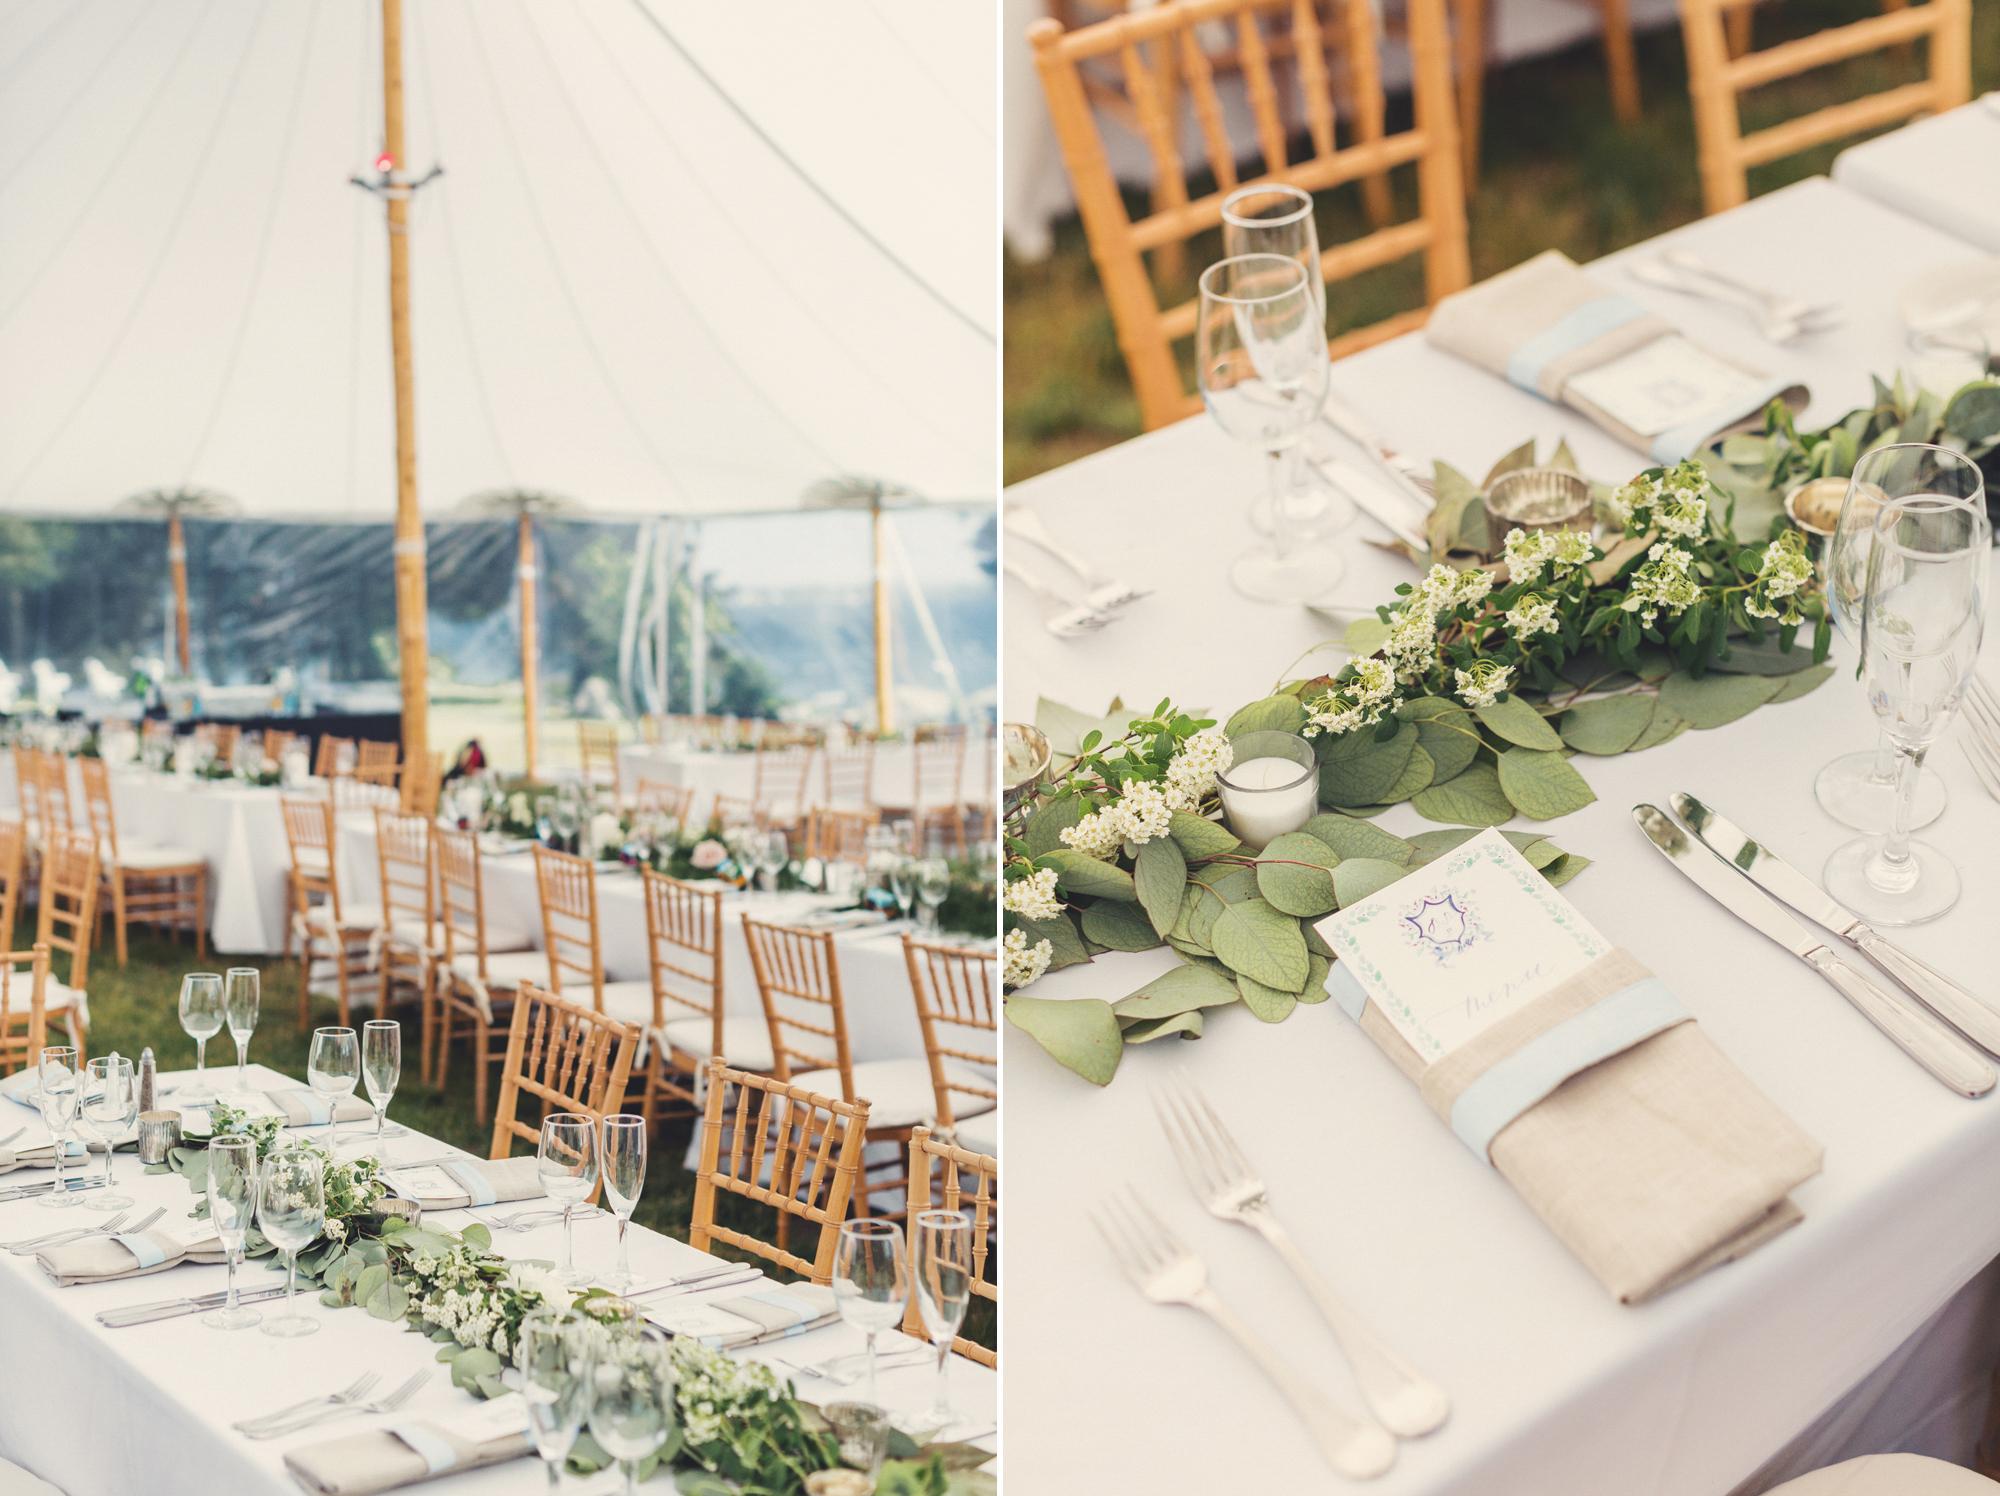 Mt Hope Farm Wedding @Anne-Claire Brun 42